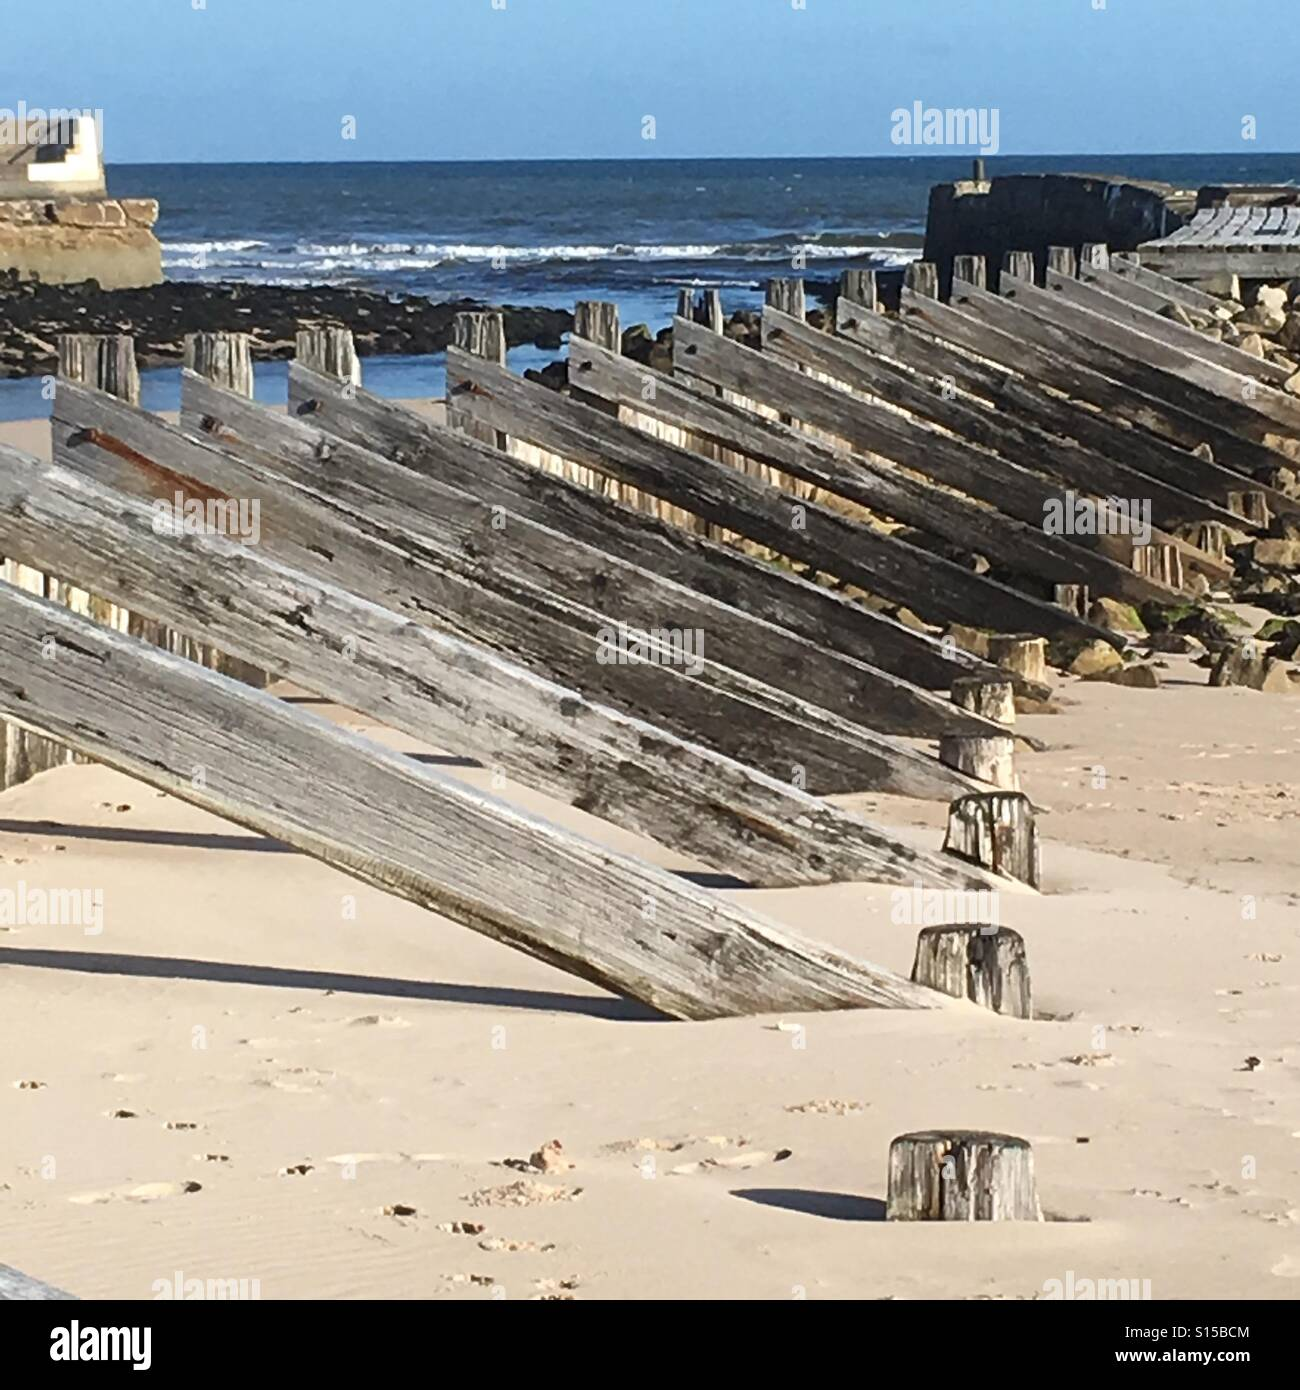 Groynes on Lossiemouth beach, Scotland - Stock Image